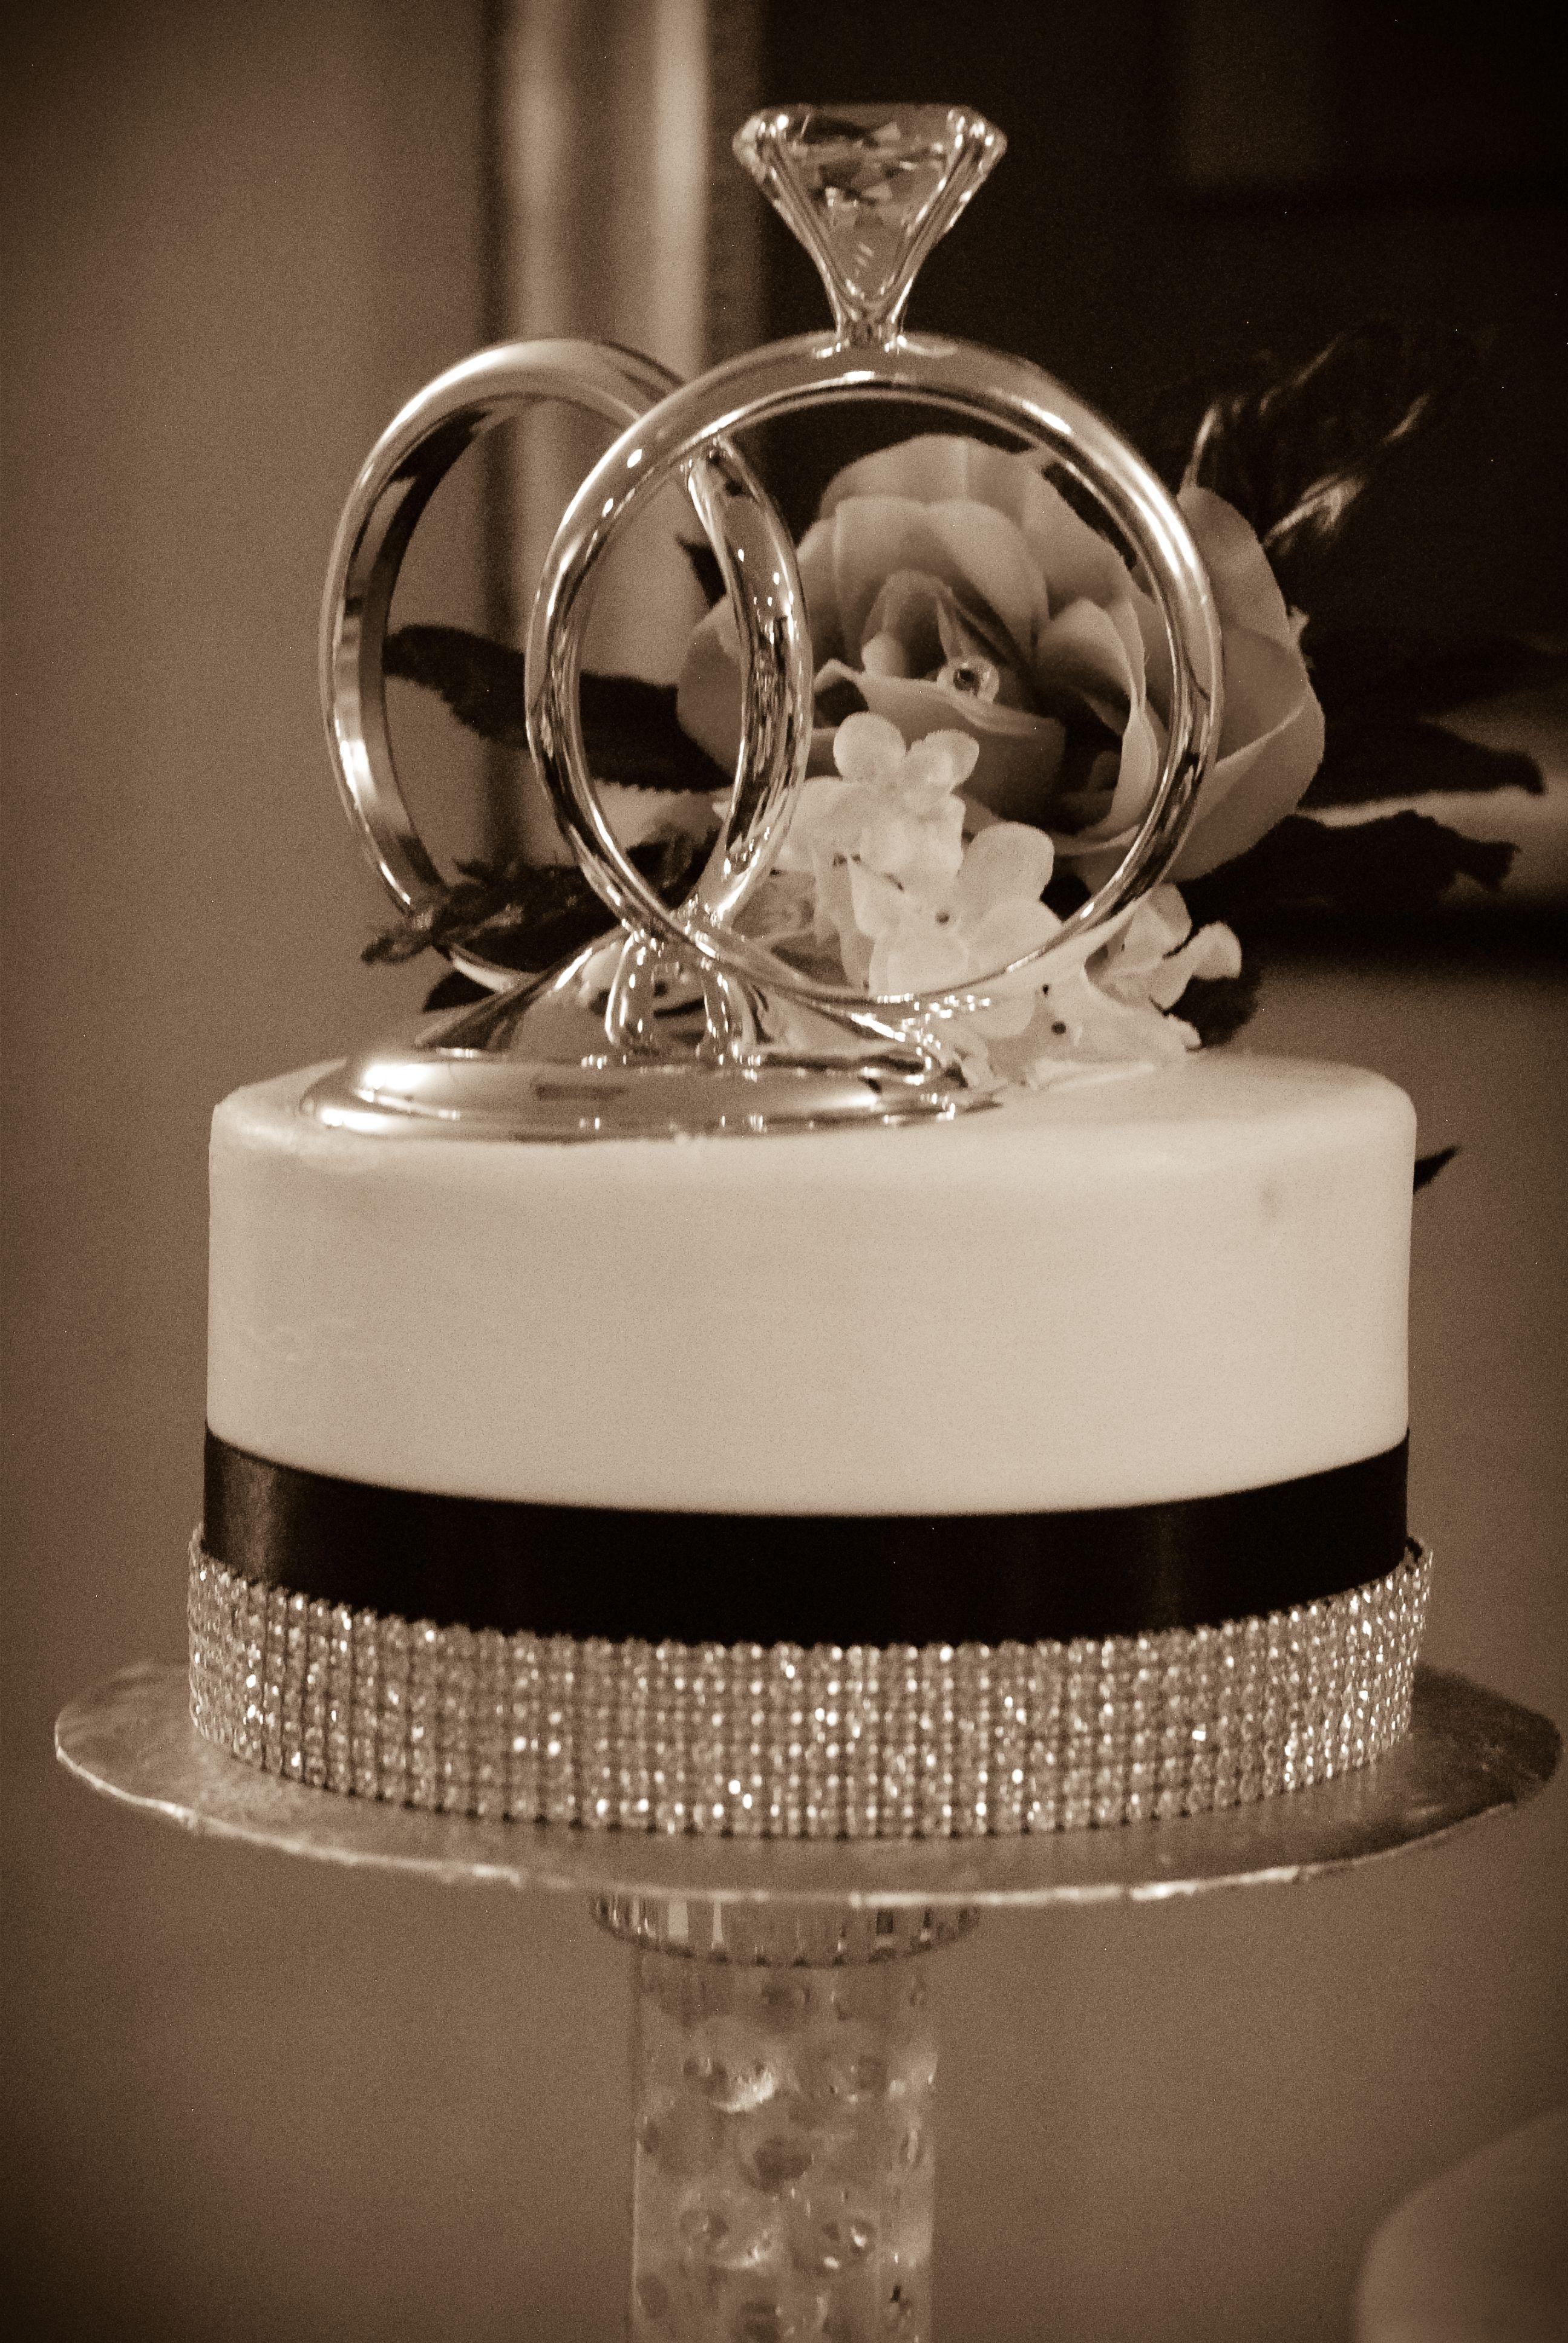 Diamond Rings Wedding Cake Topper: Cake Topper Wedding Silver Diamond Ring At Websimilar.org